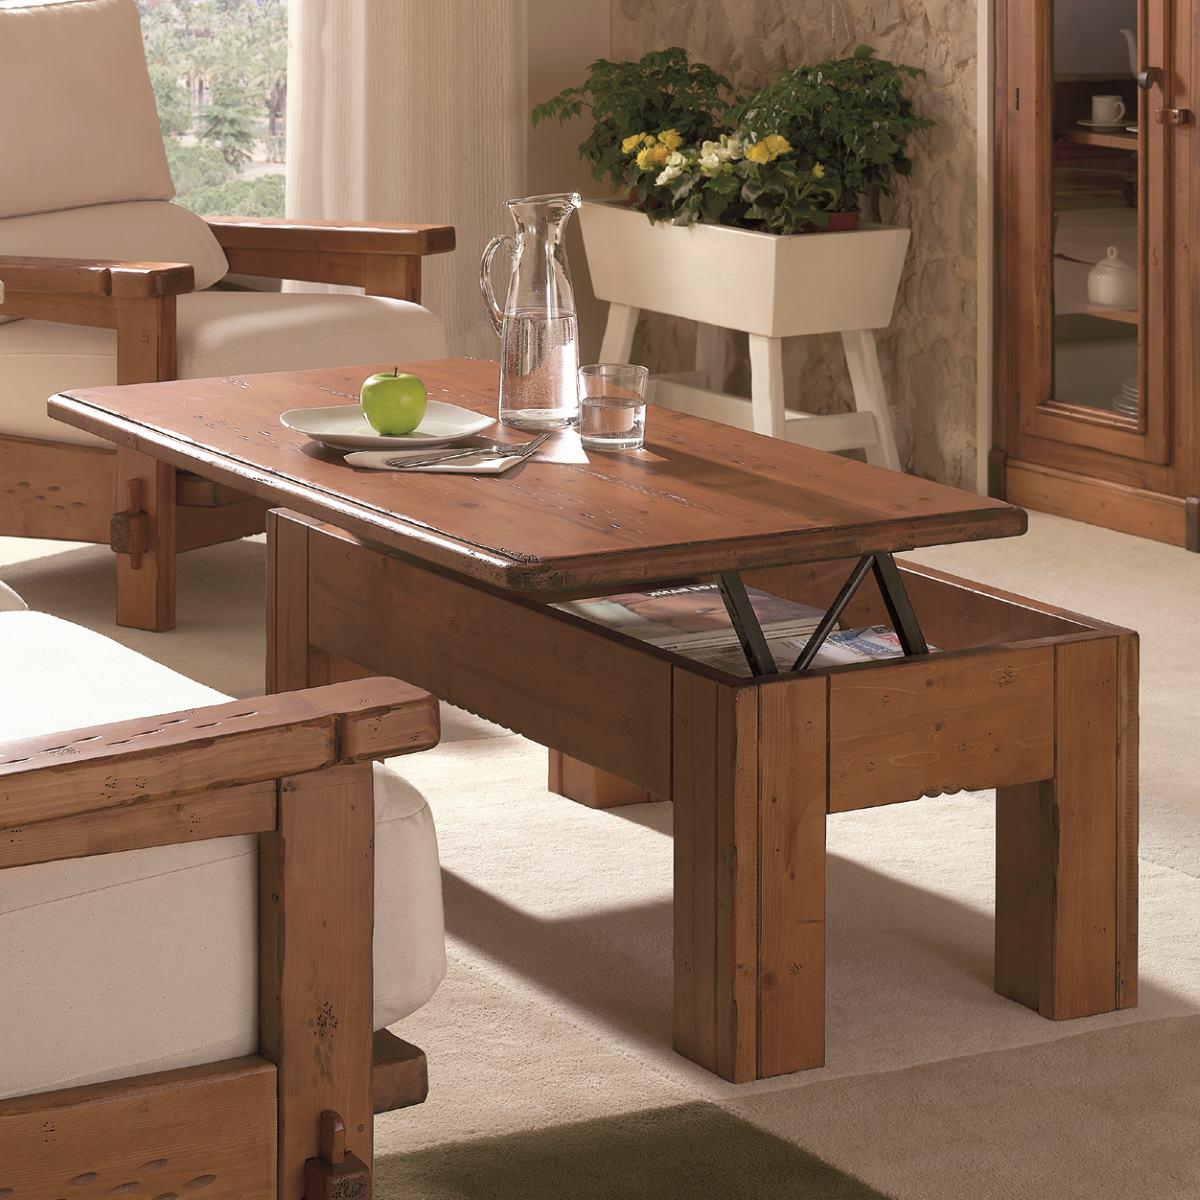 Mesa de centro r stica elevable ecor stico venta de muebles - Mesas de centro rusticas ...